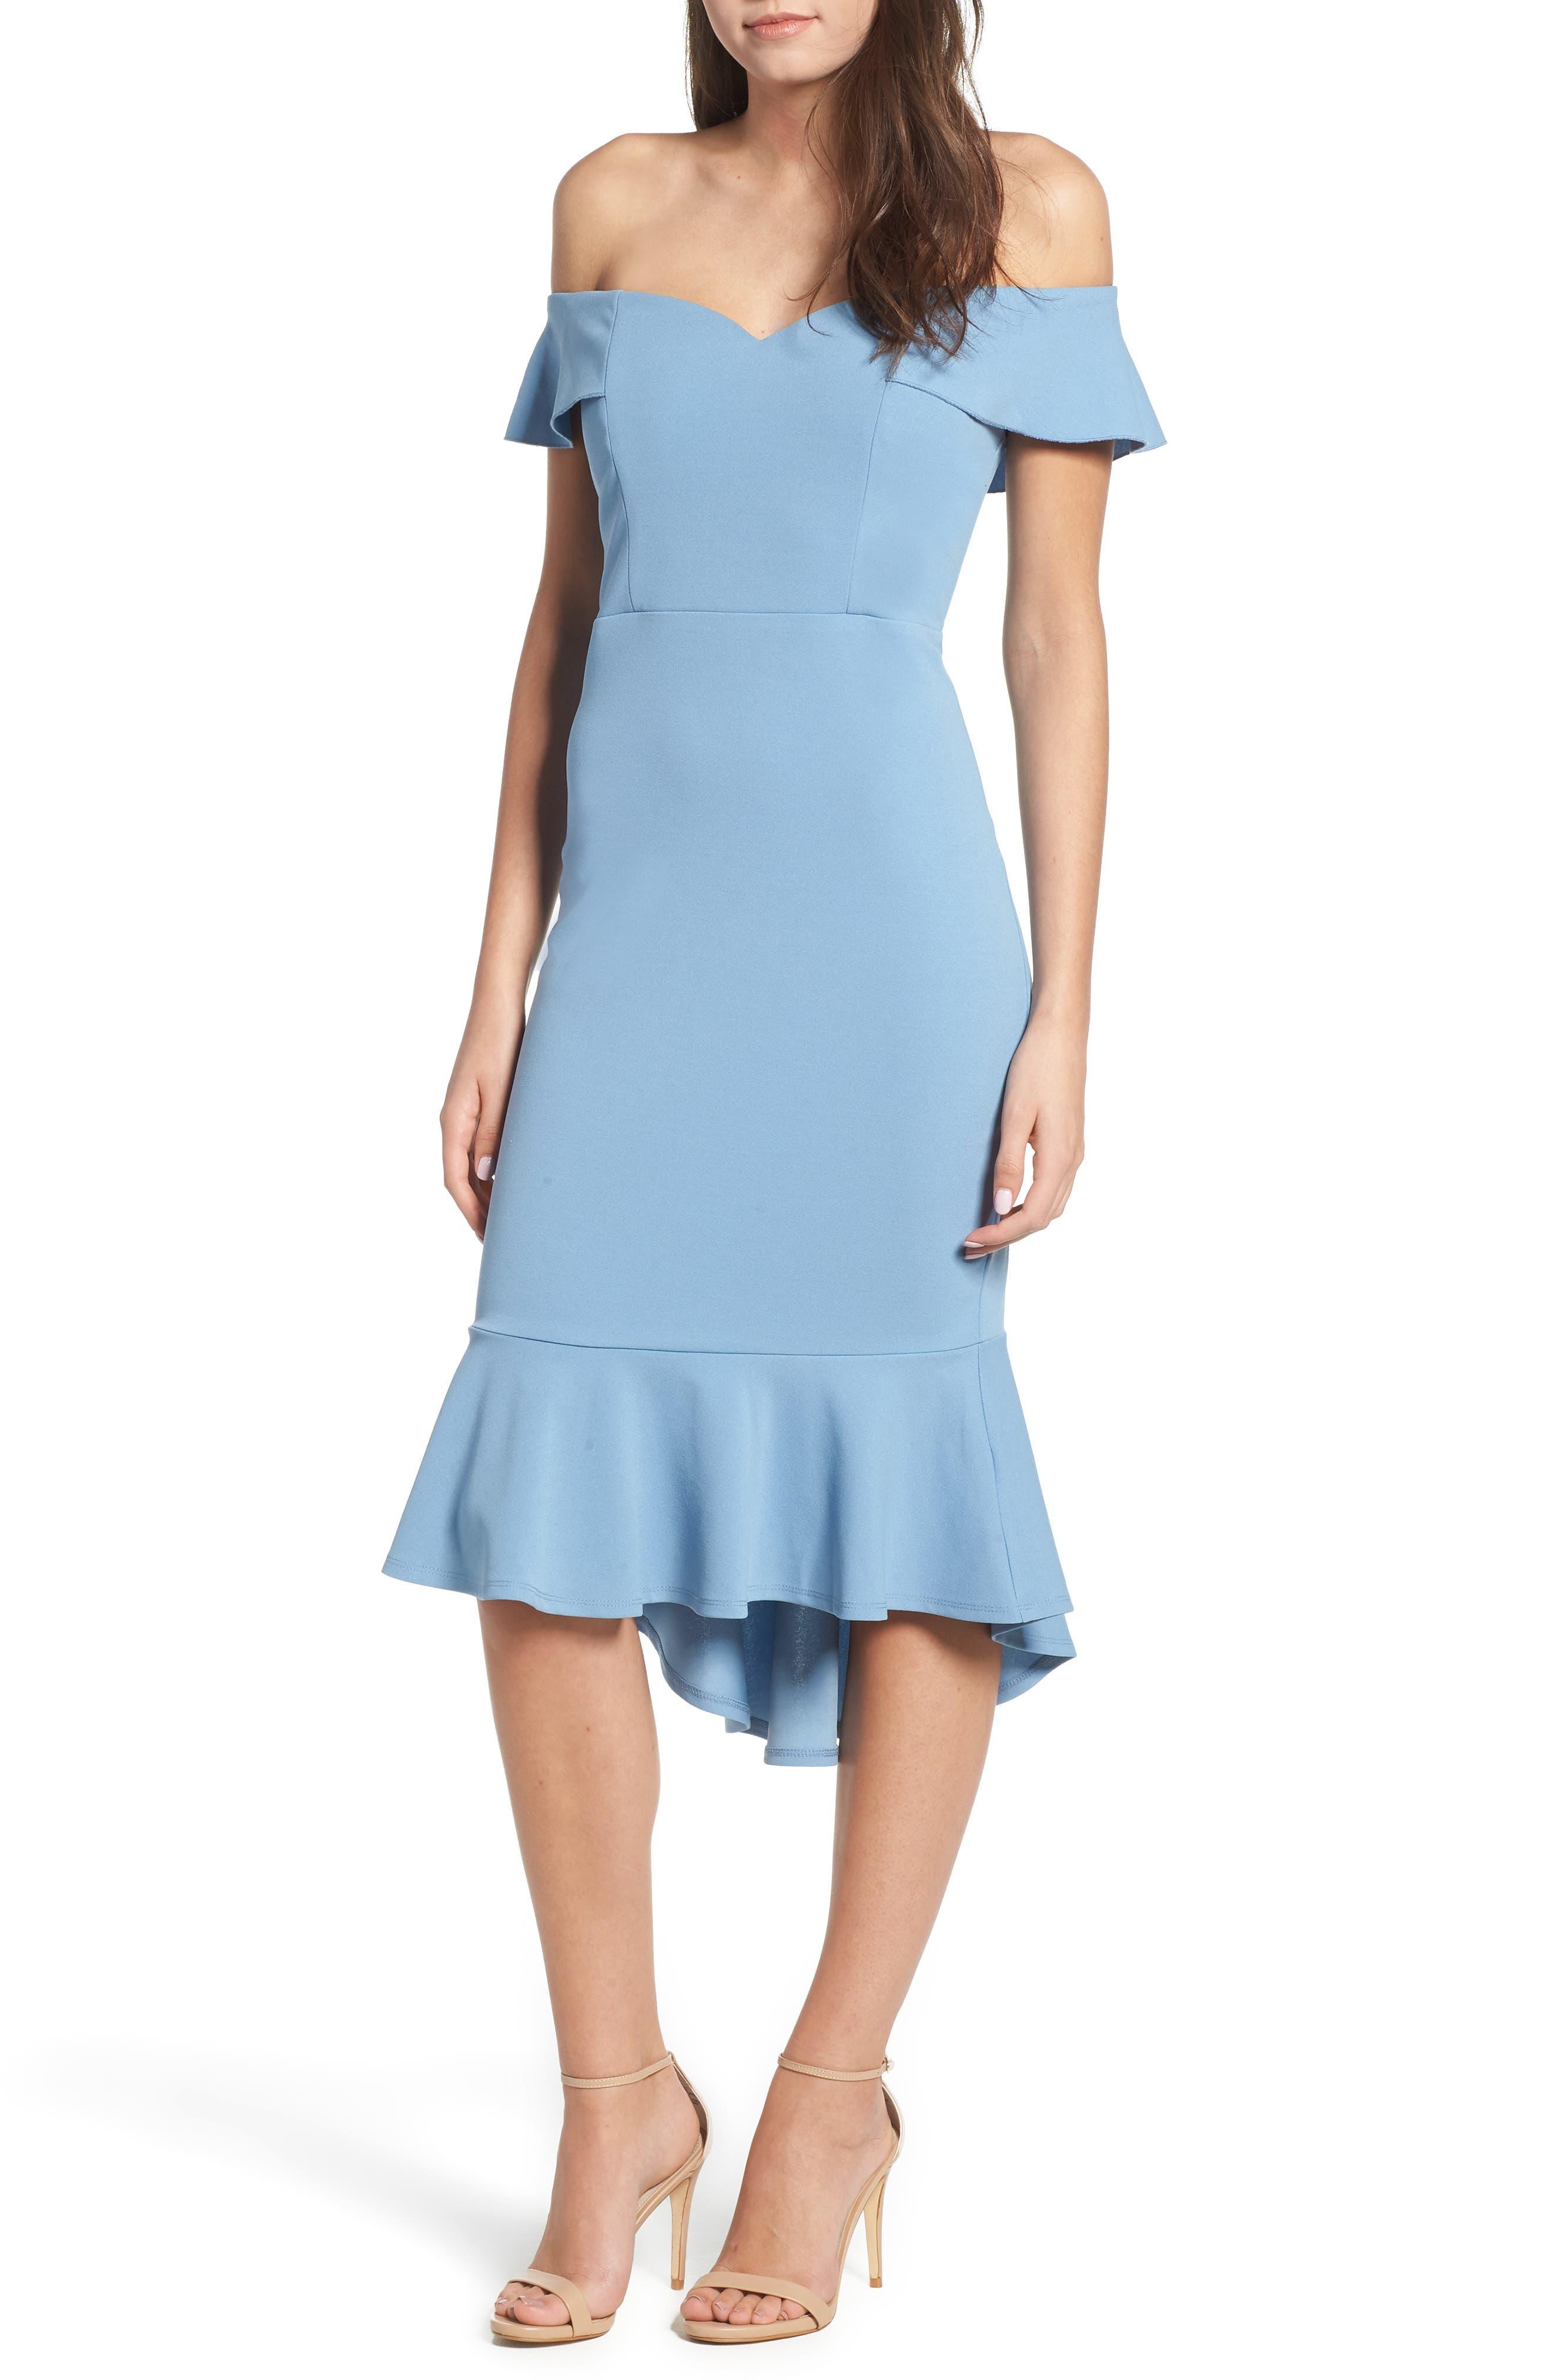 LOVE, NICKIE LEW Sweetheart Midi Dress, Main, color, 400